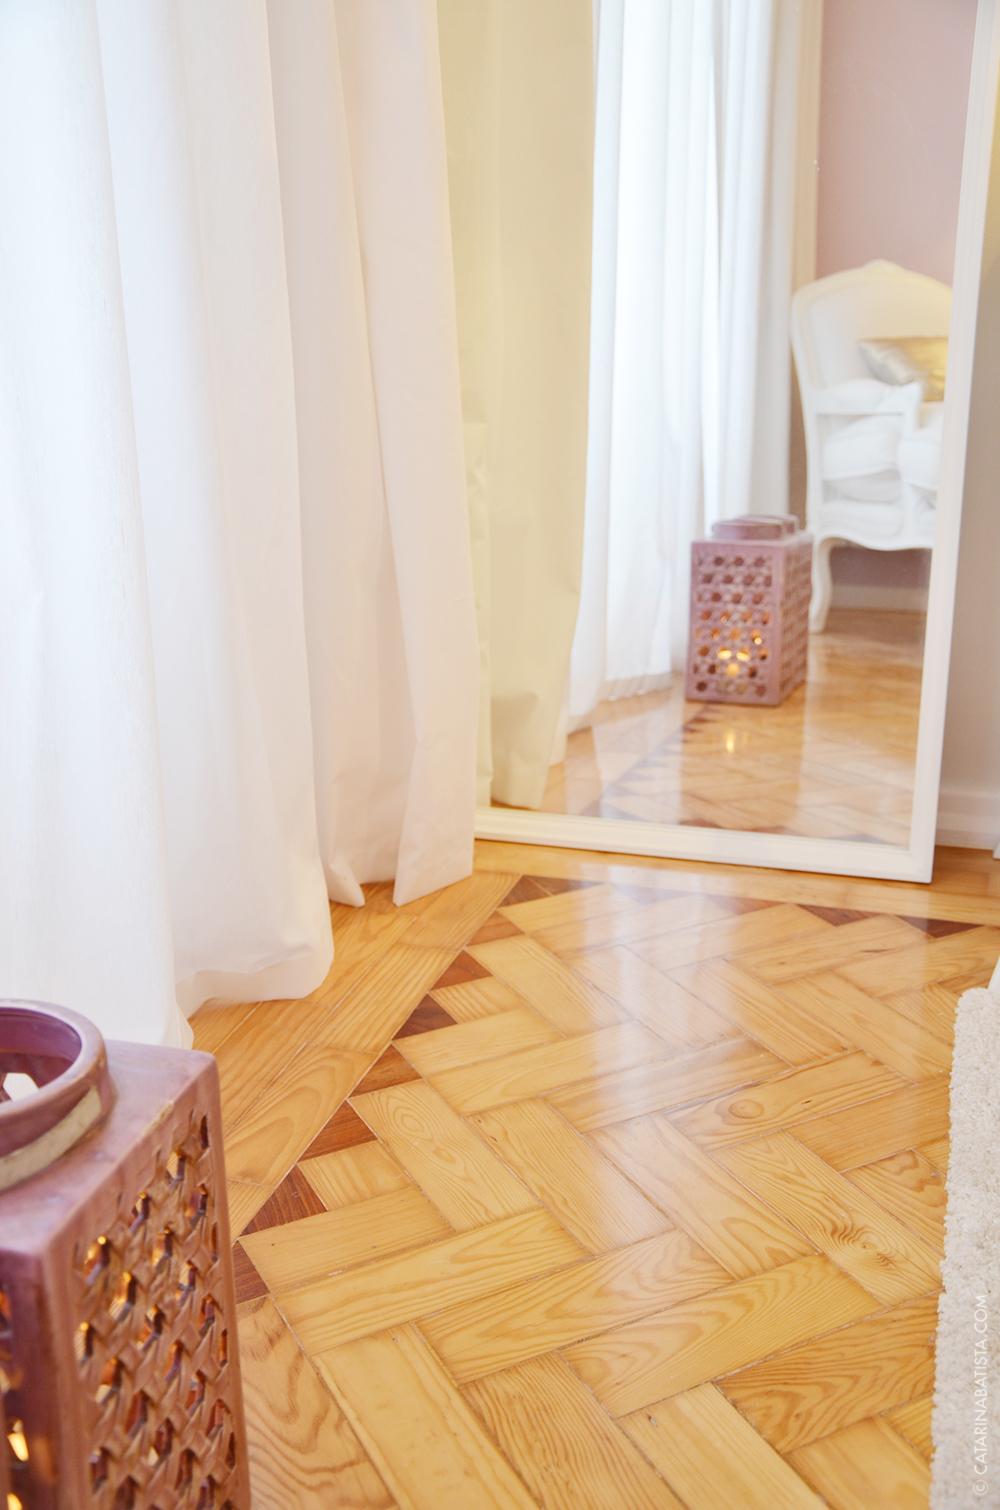 41-catarina-batista-arquitectura-design-interior-decoracao--apartamento-quarto-bedroom-livingroom-sala.jpg